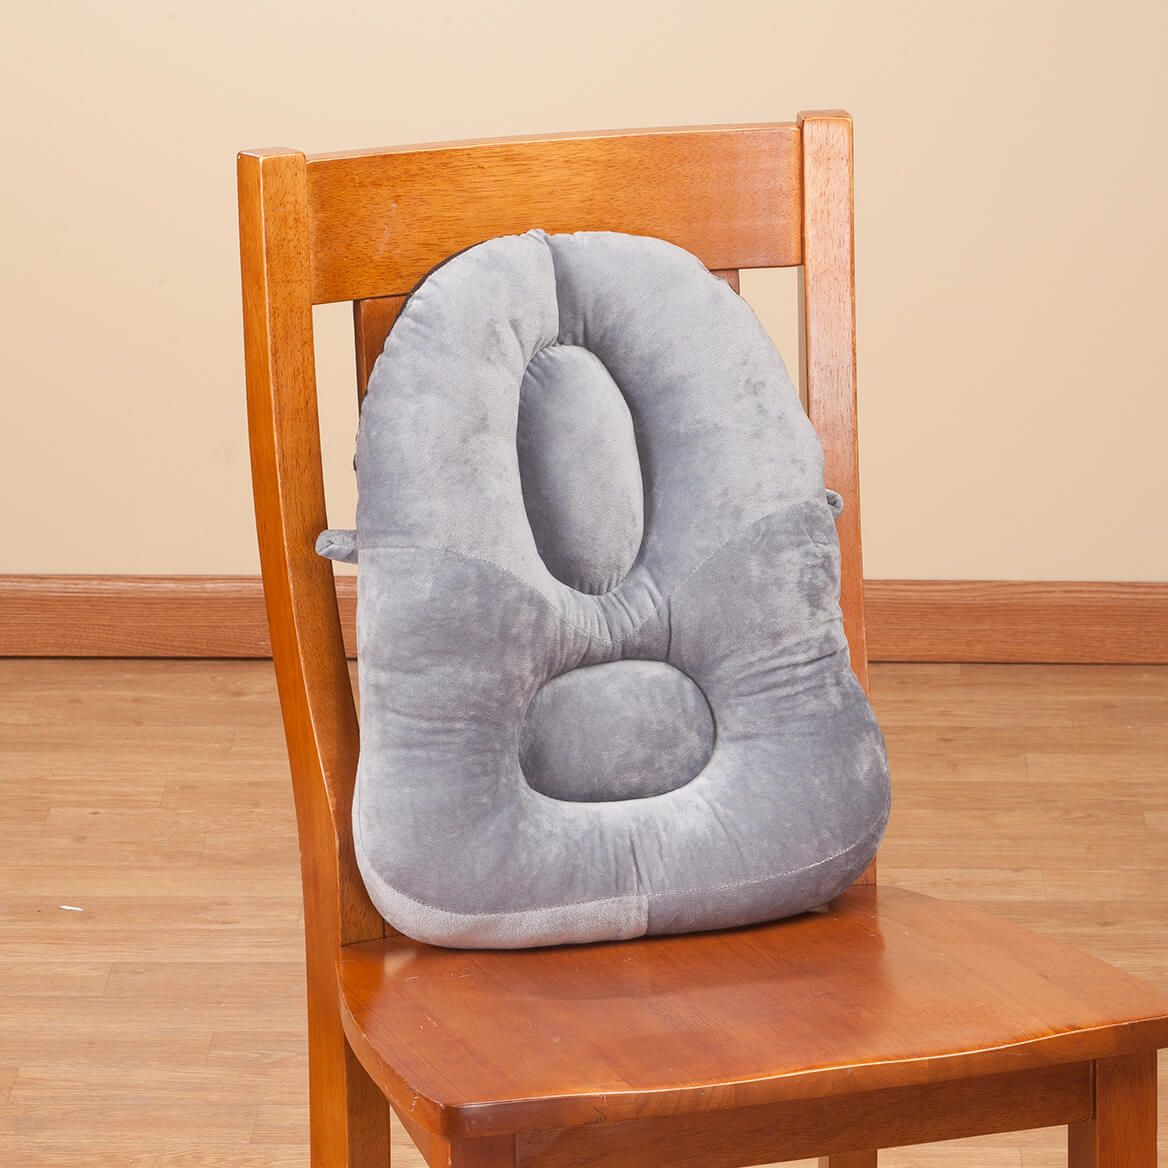 Posture Support Back Cushion-362415